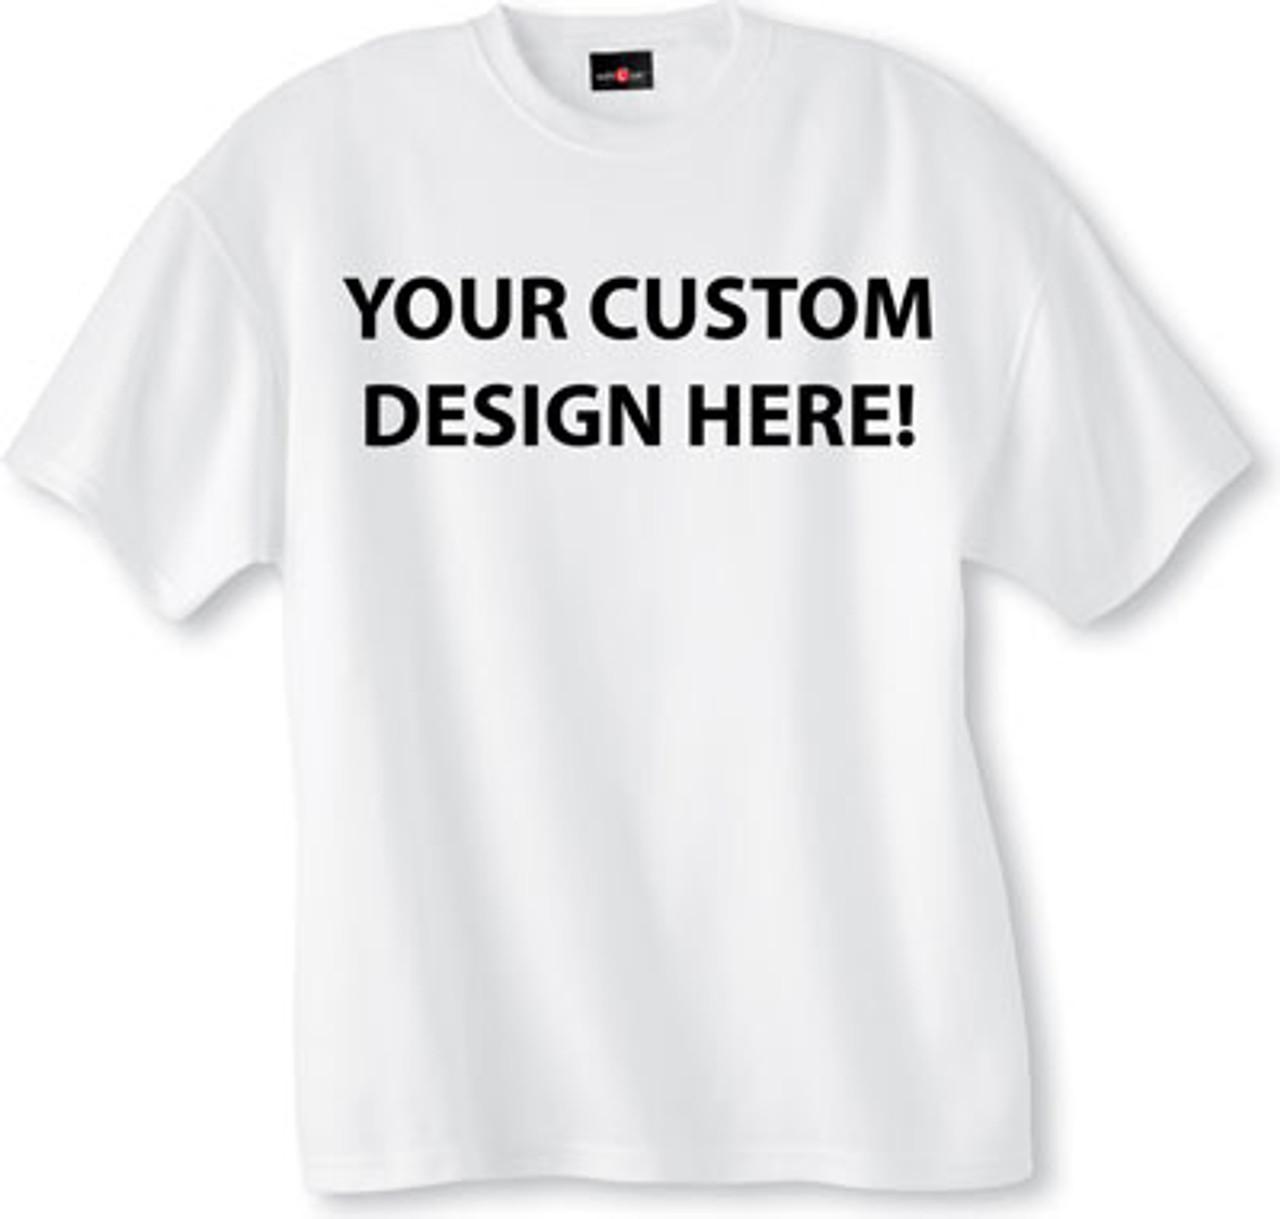 Custom, Nightclub, Party, Branded, Brand, T-Shirt, TSHIRT, Press, Print,  silk screen, digital print, color, printied, custom ,personalized, tank top , T